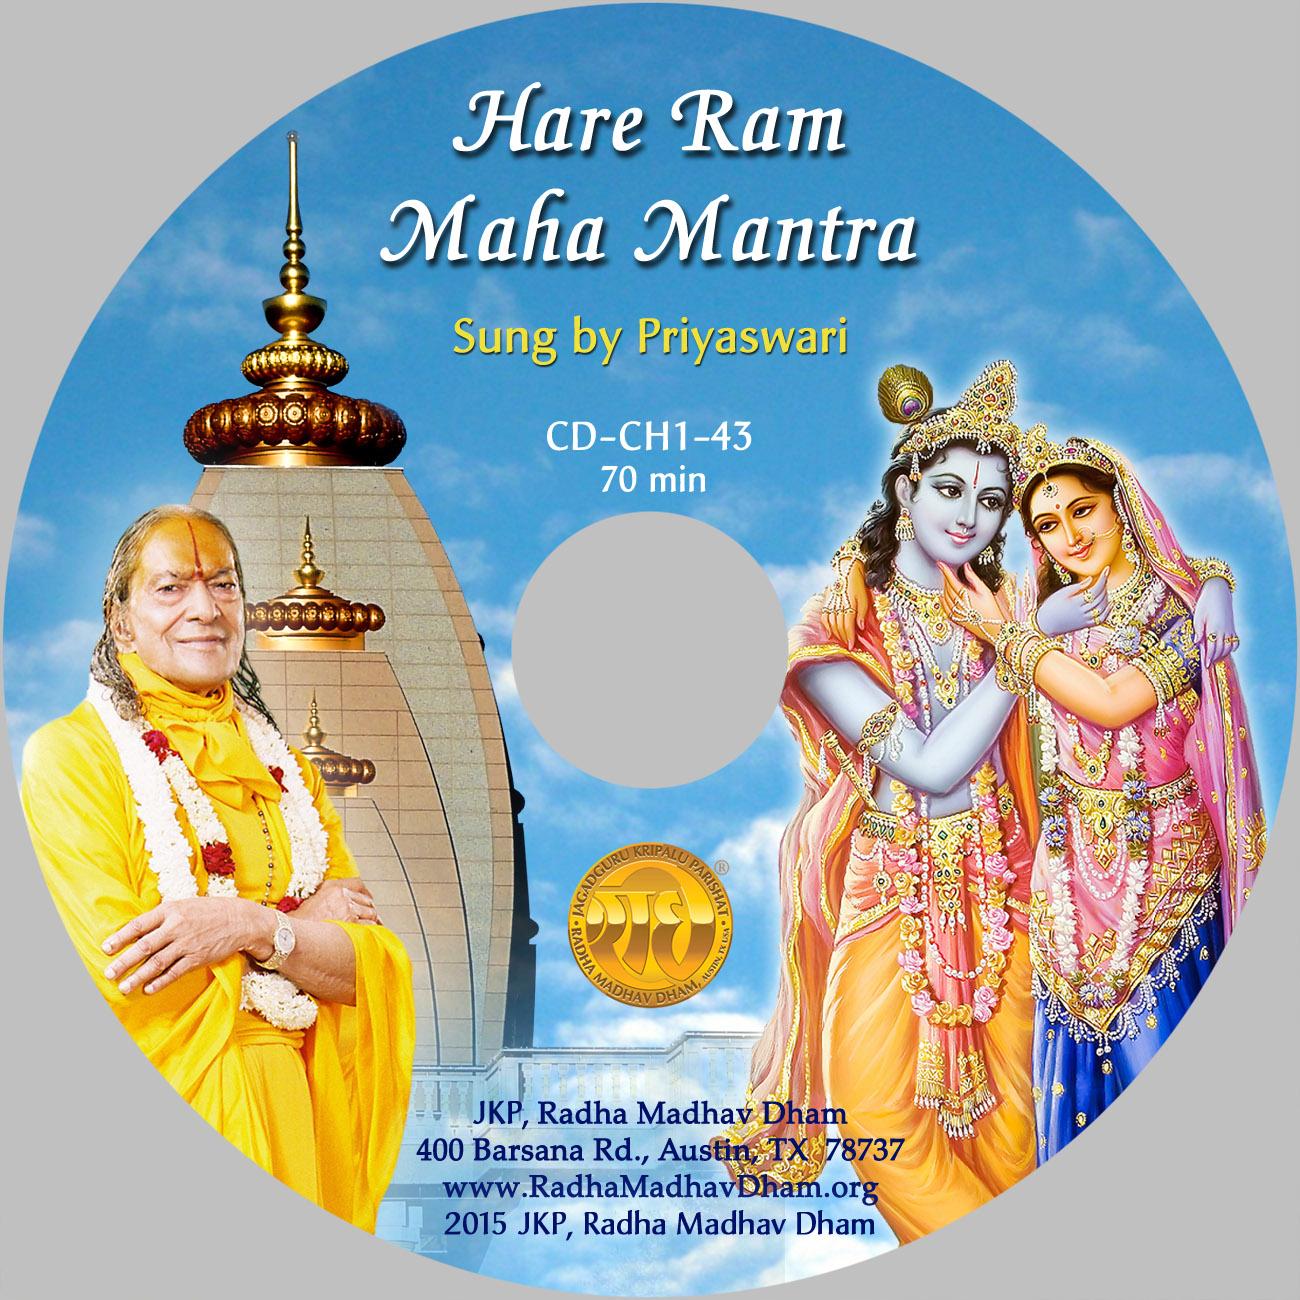 Ch1-43 Garu Ram Disc